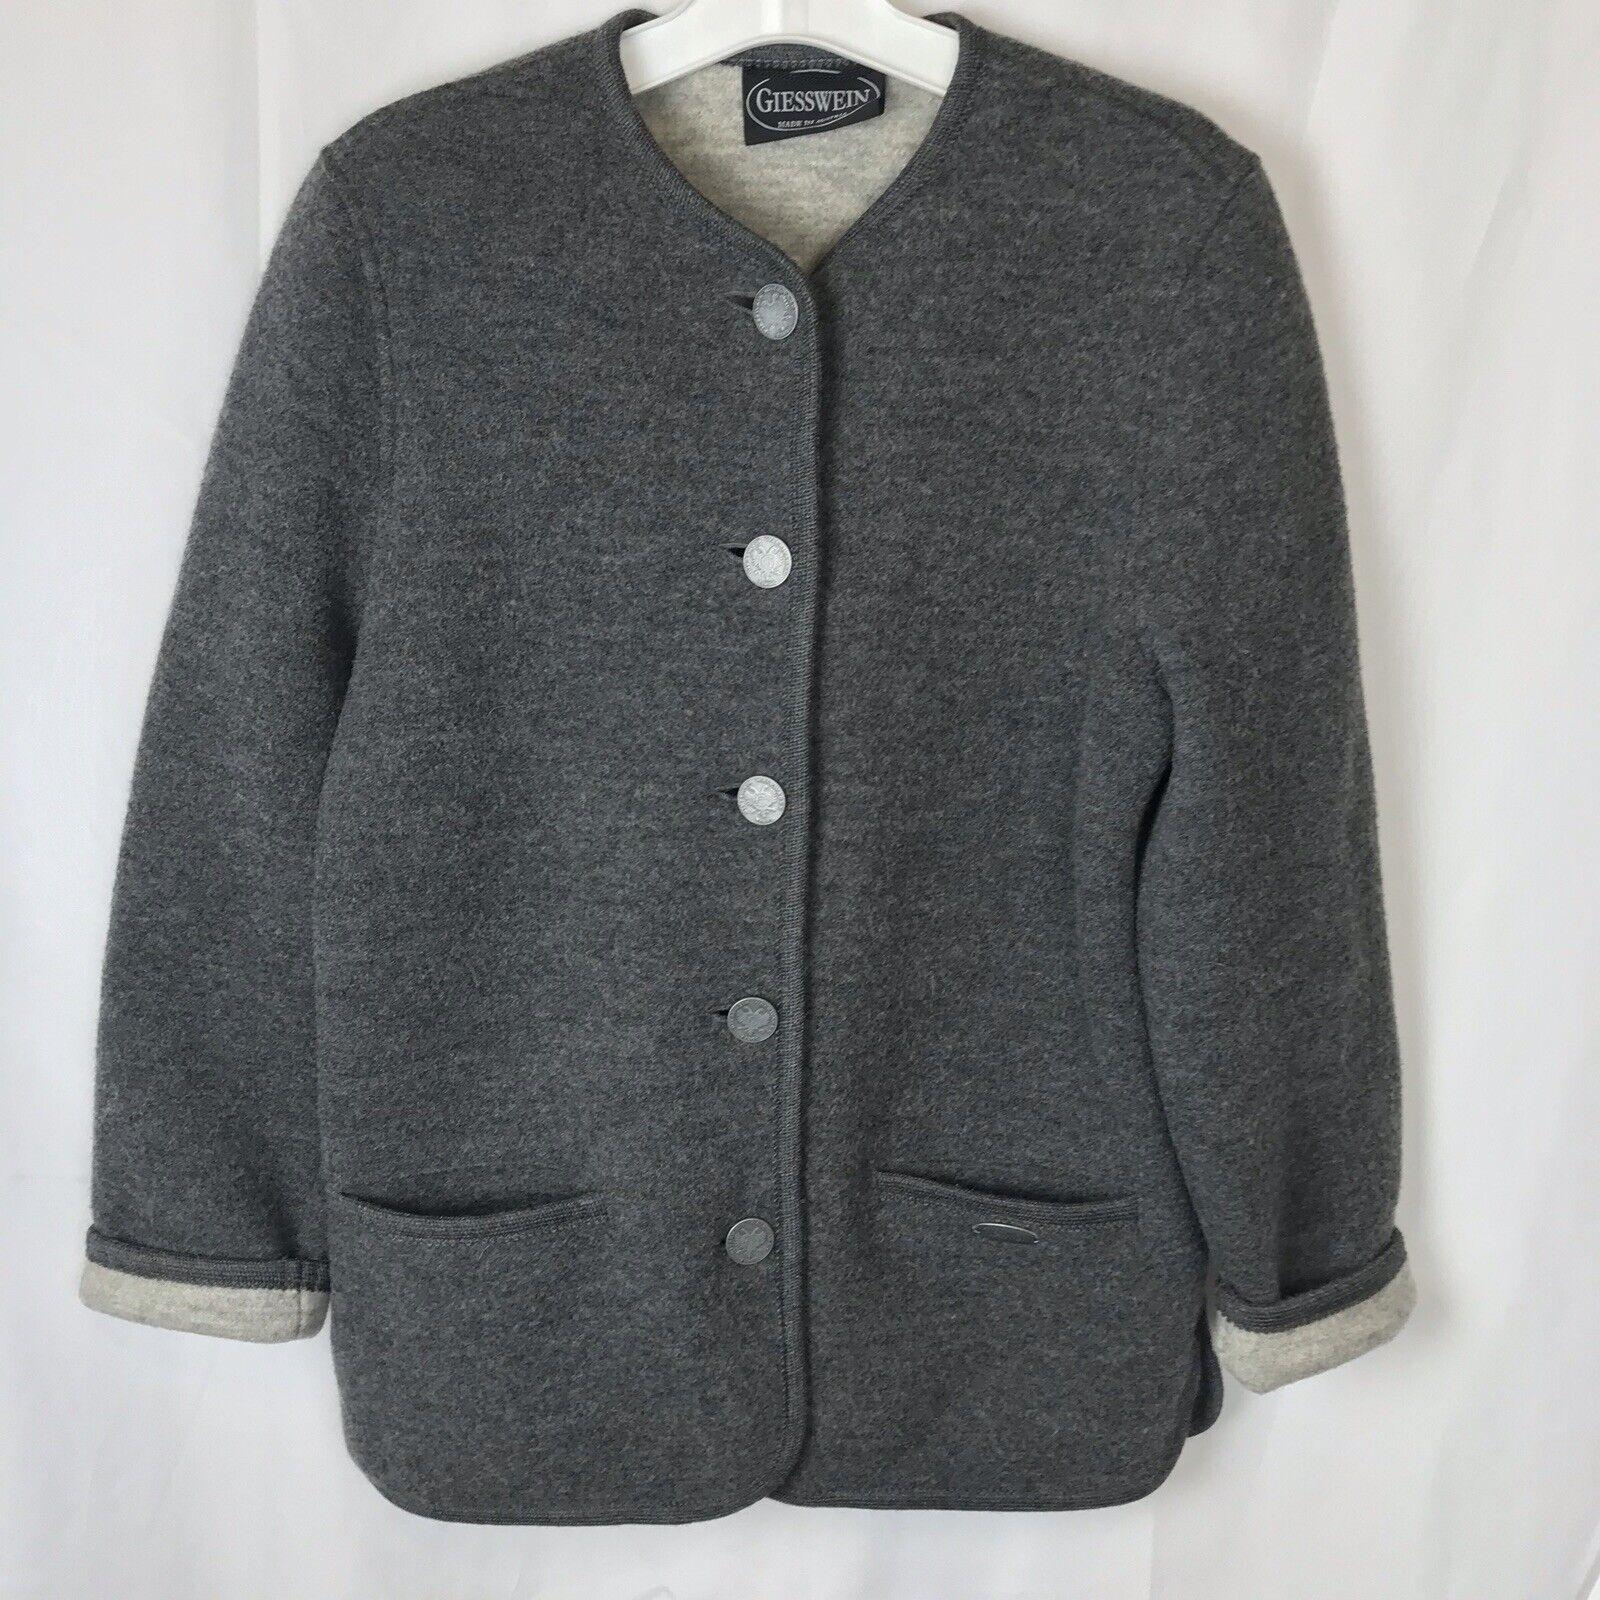 Giesswein Austria 100% Wool Button Front Cardigan Sweater Jacket damen 38 Large